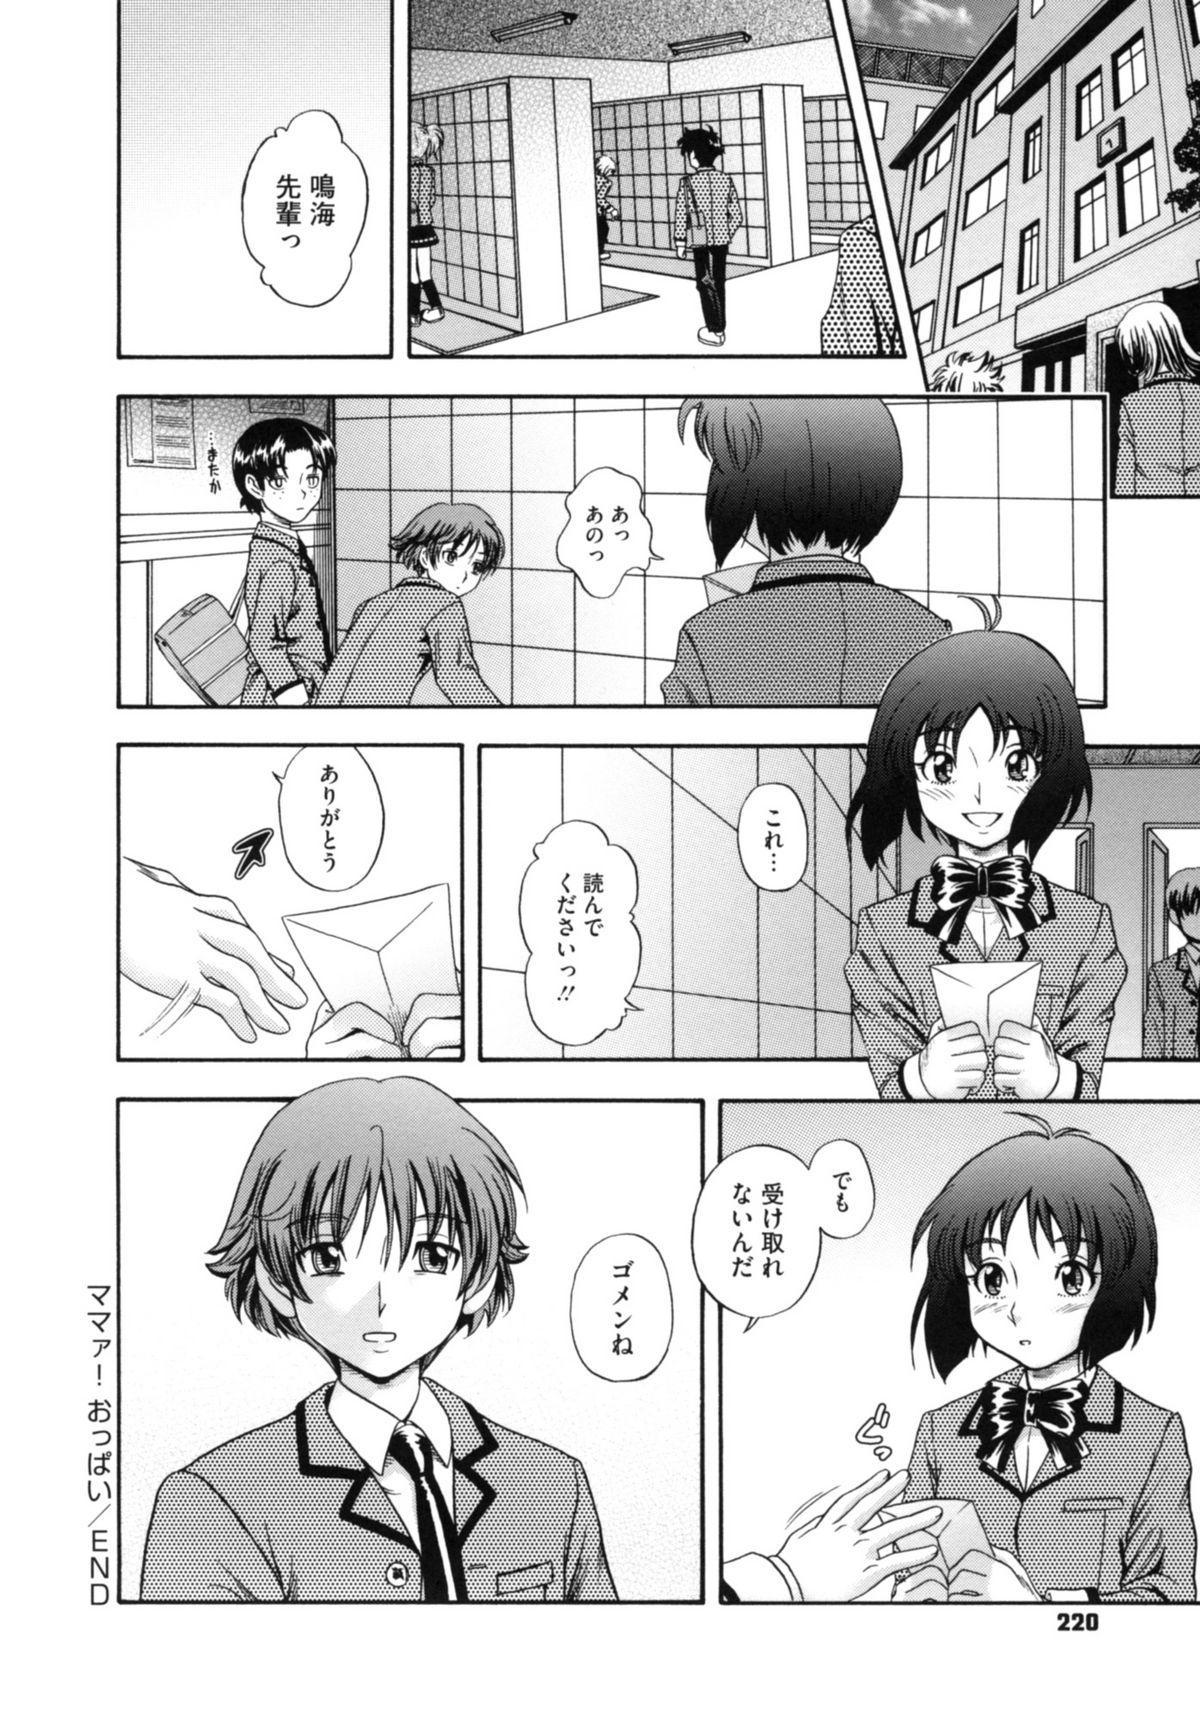 Soushisouai Note Nisatsume 229